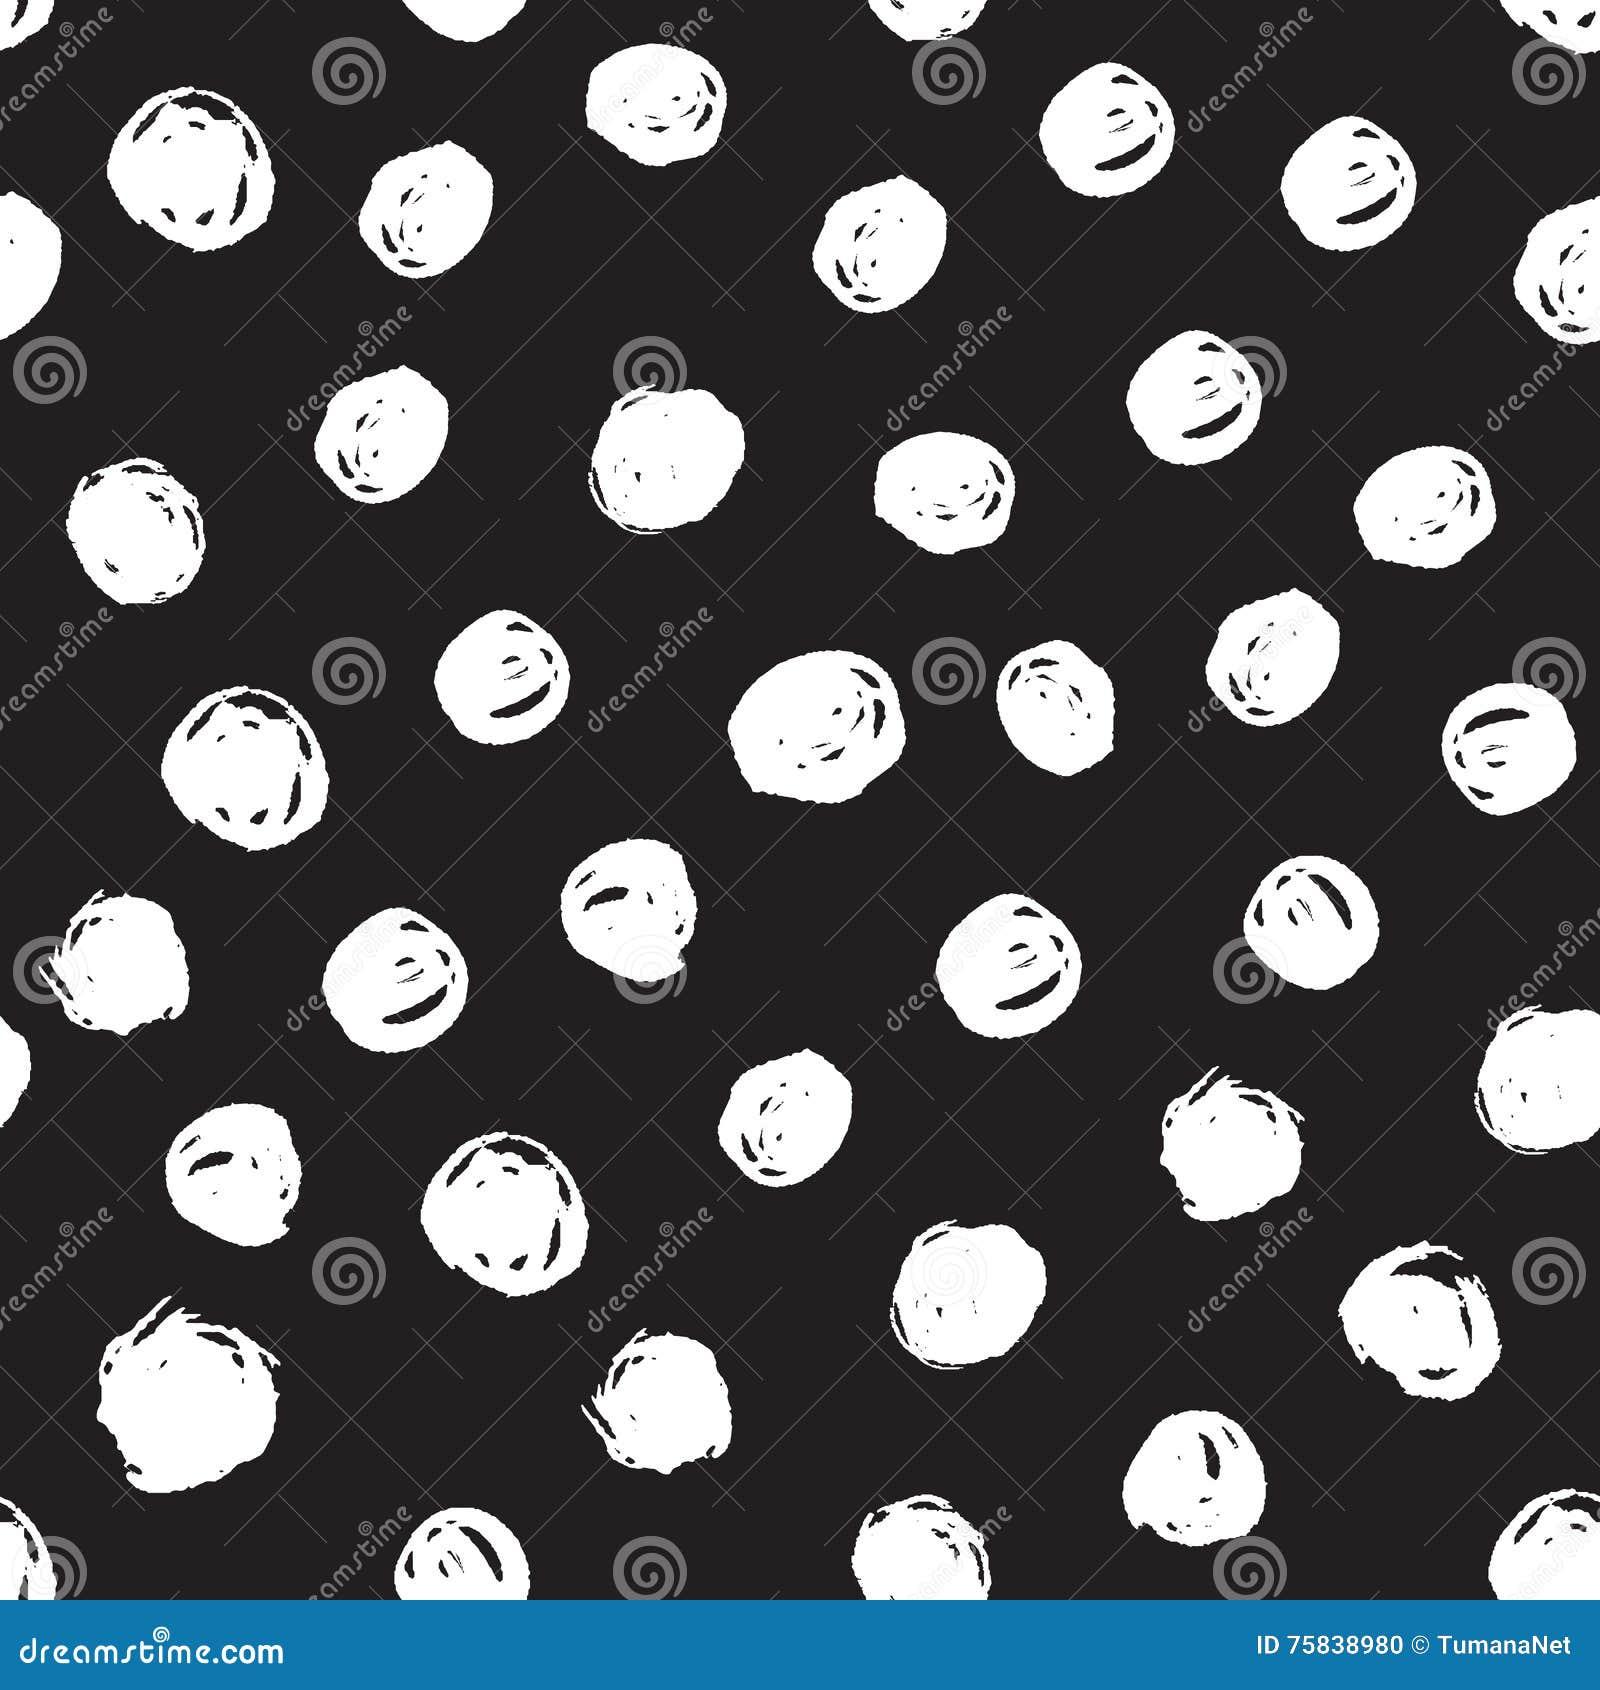 Seamless Monochrome Geometric Pattern Background With Sketch